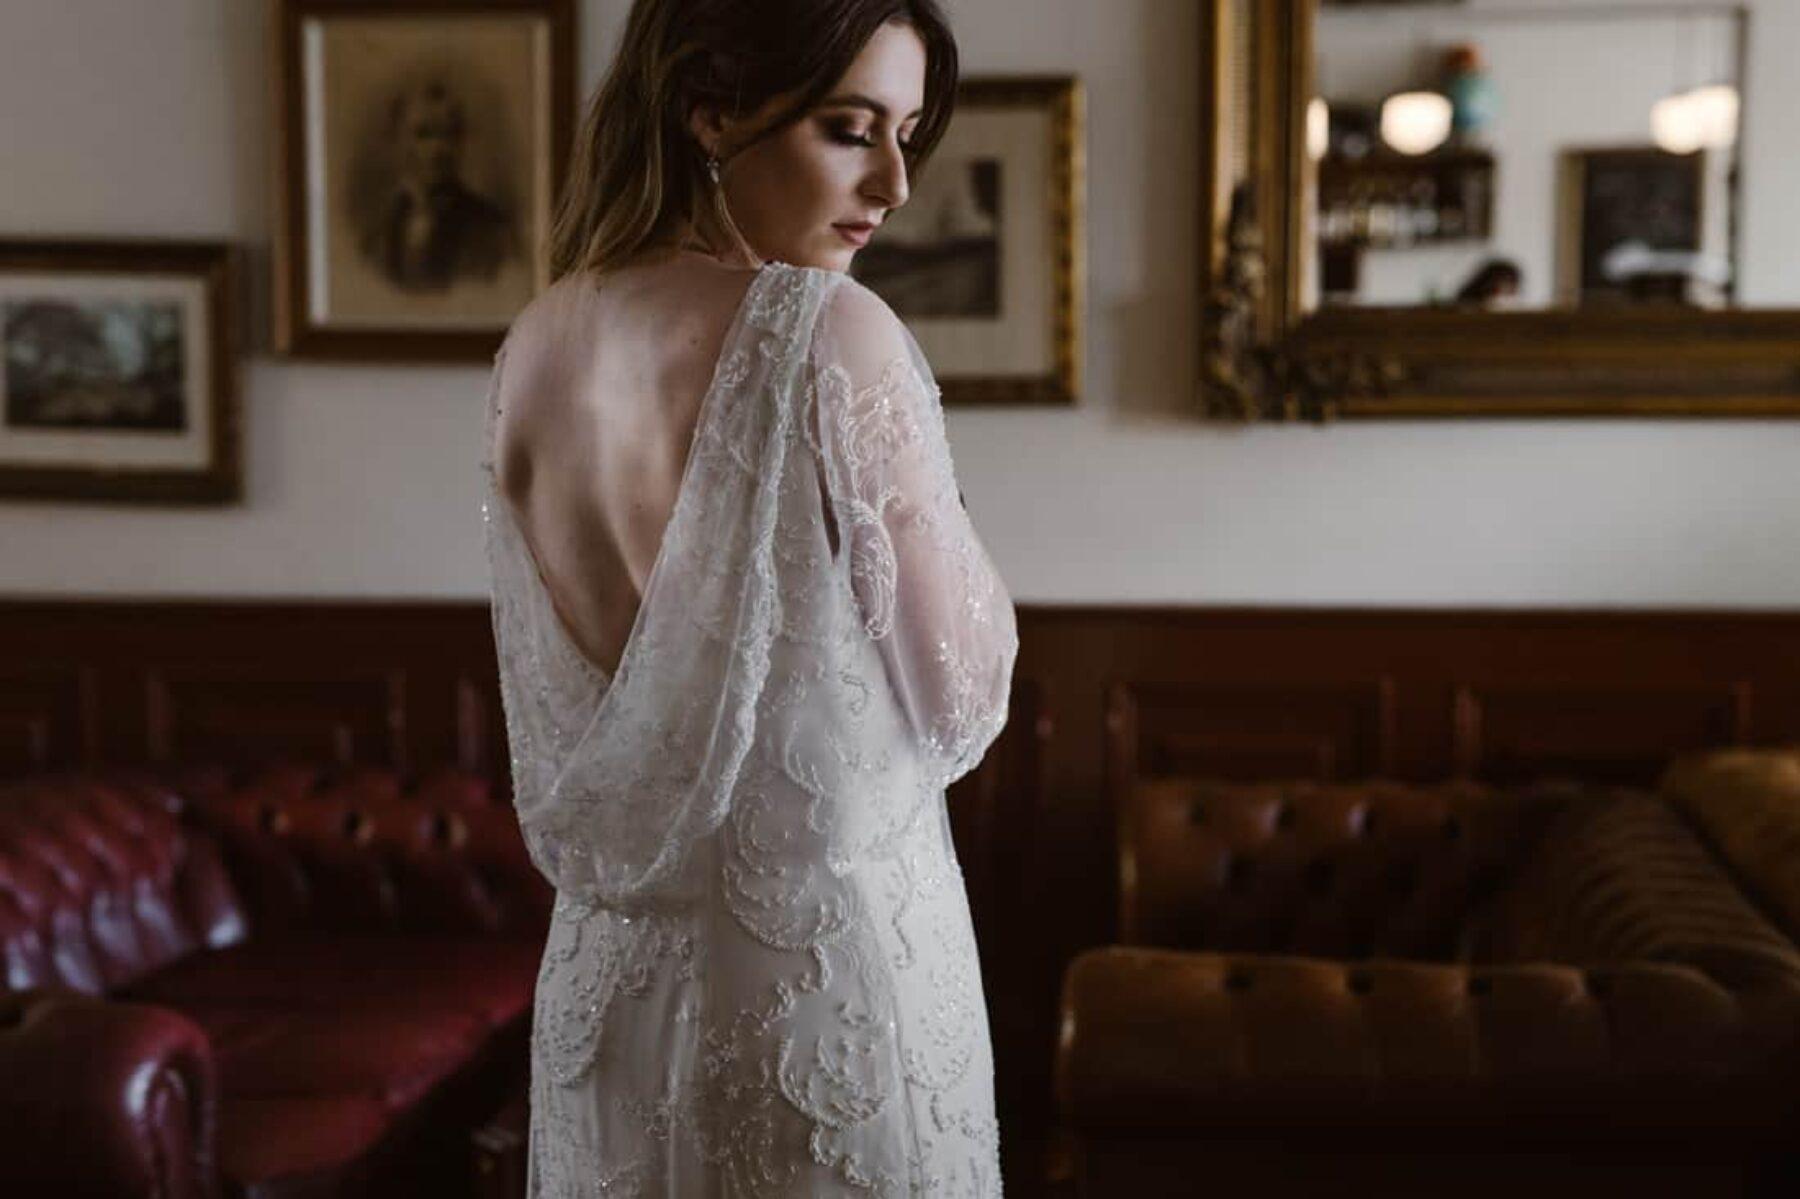 vintage wedding dress by Elvi Design